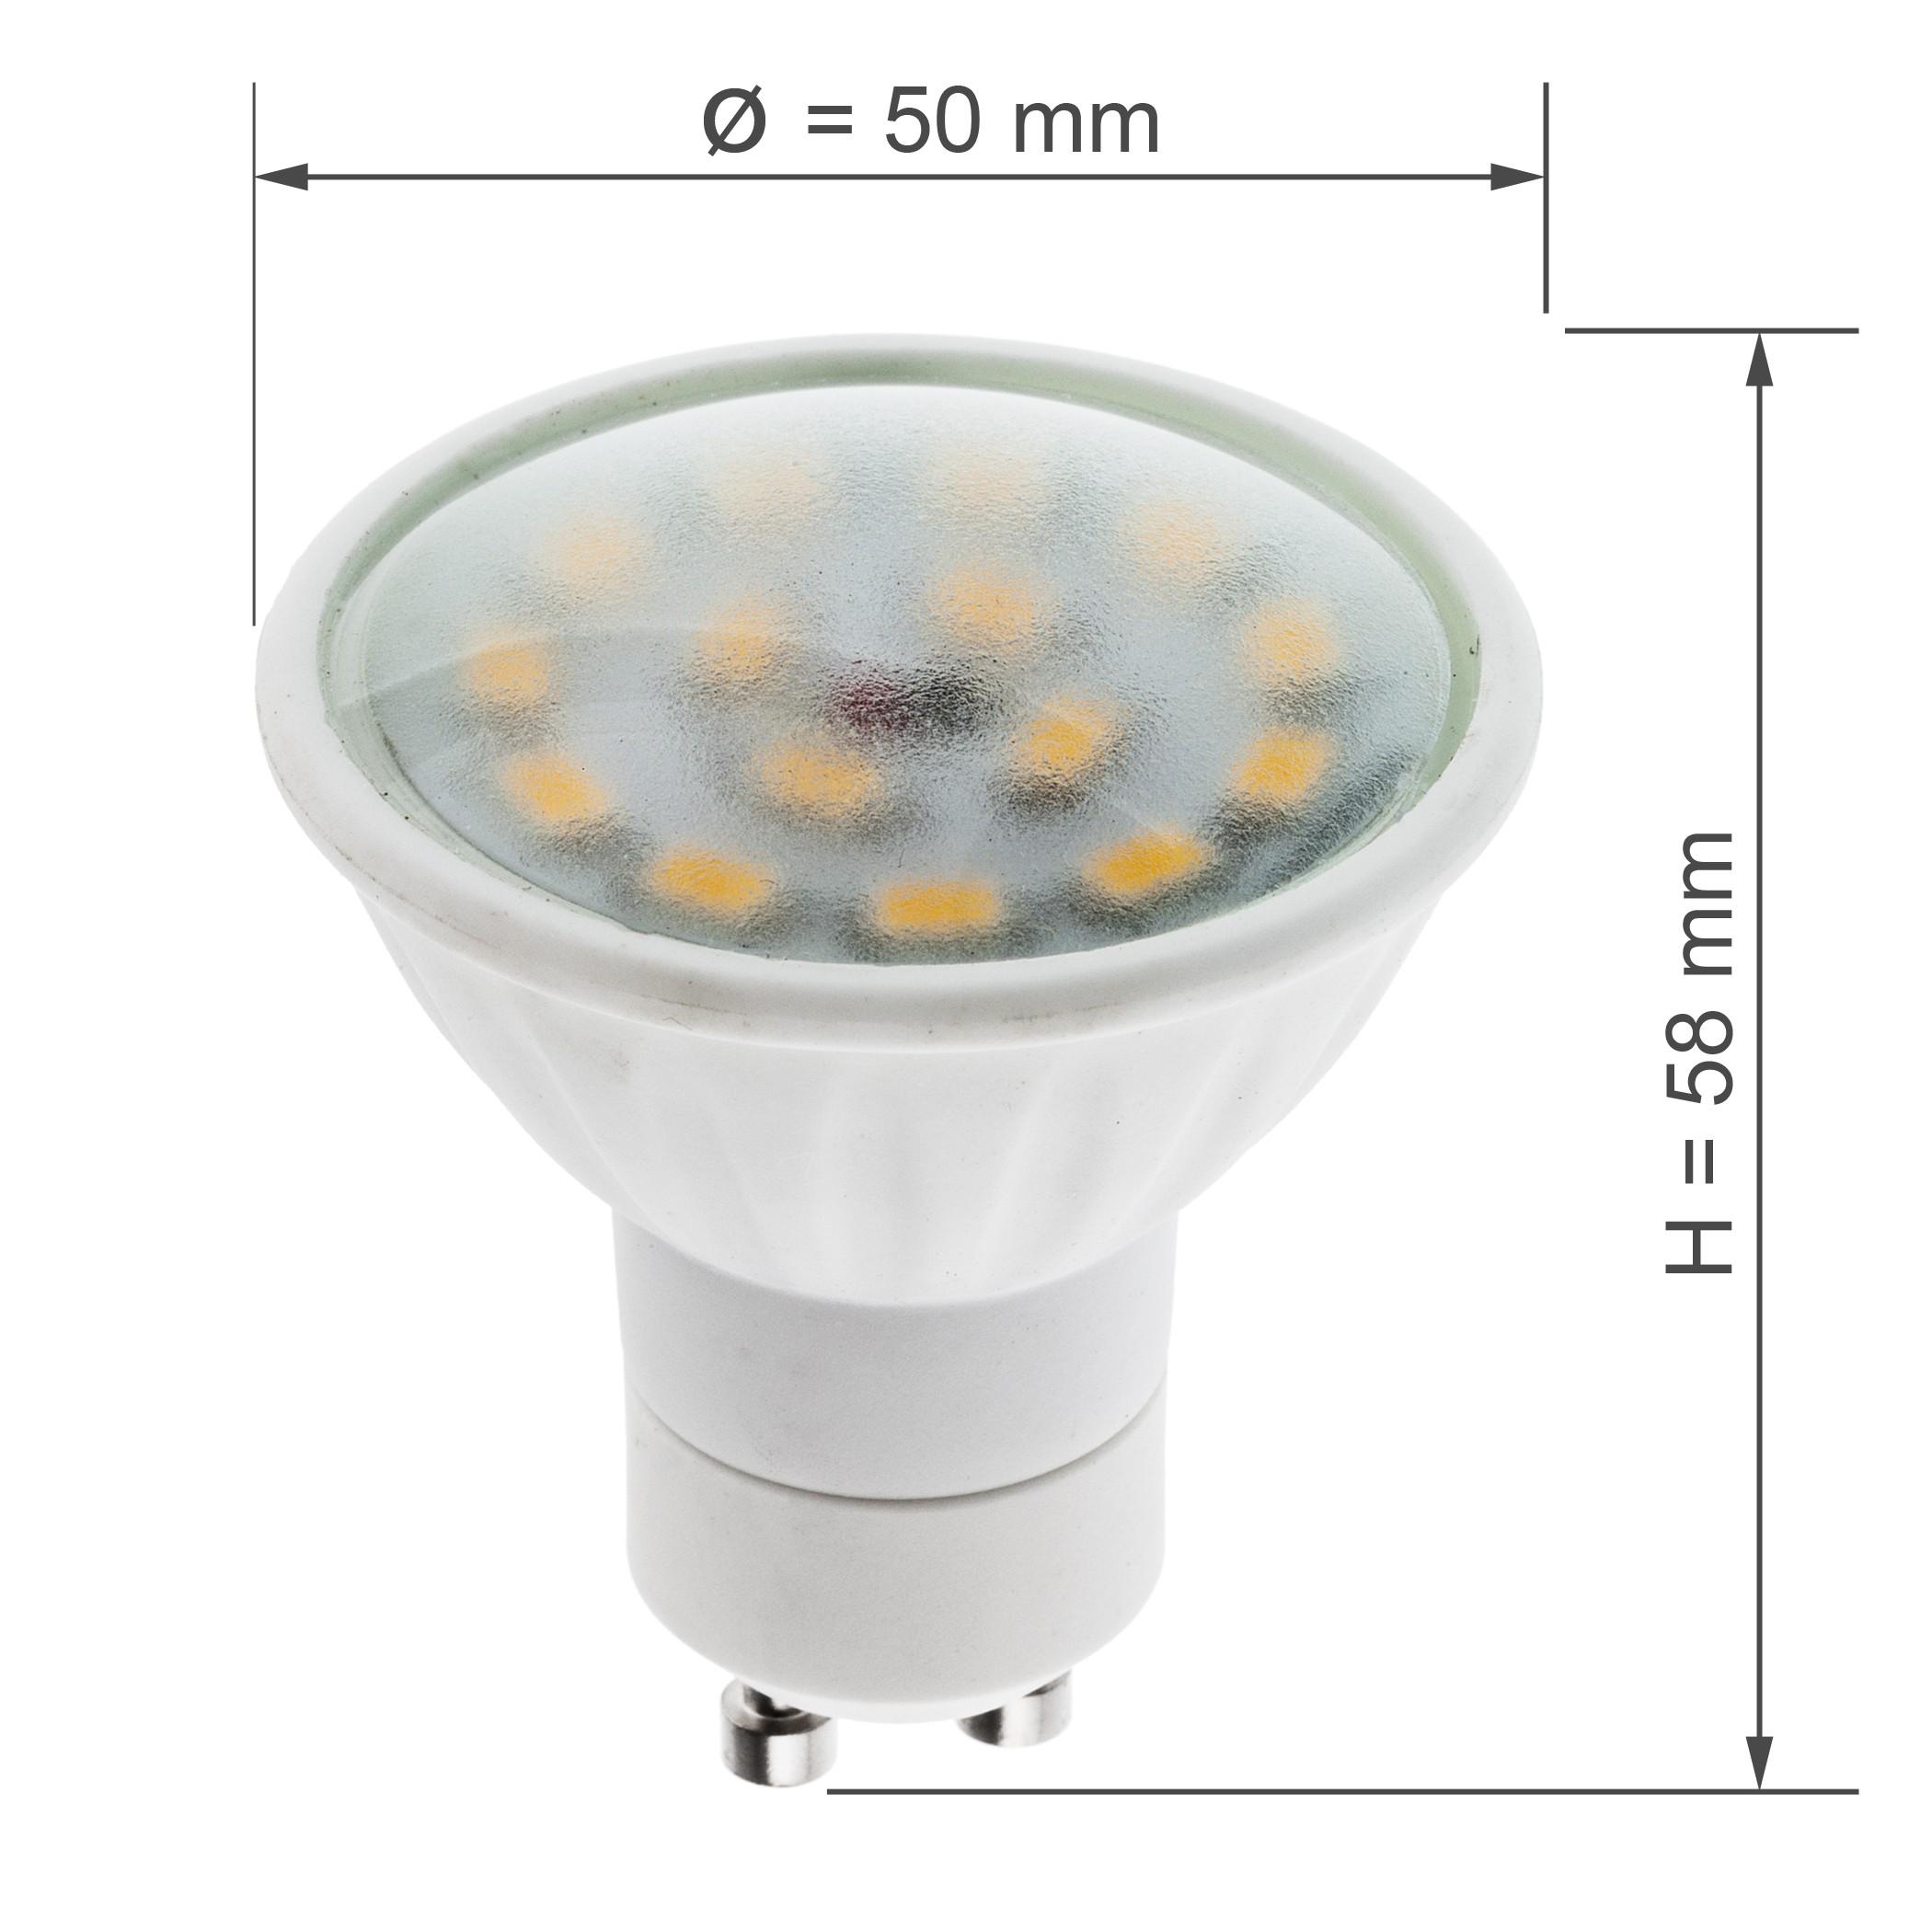 led lampen gu10 dimmbar gu10 led 6w warmweiss sebson led leuchtmittel gu10 ebay. Black Bedroom Furniture Sets. Home Design Ideas